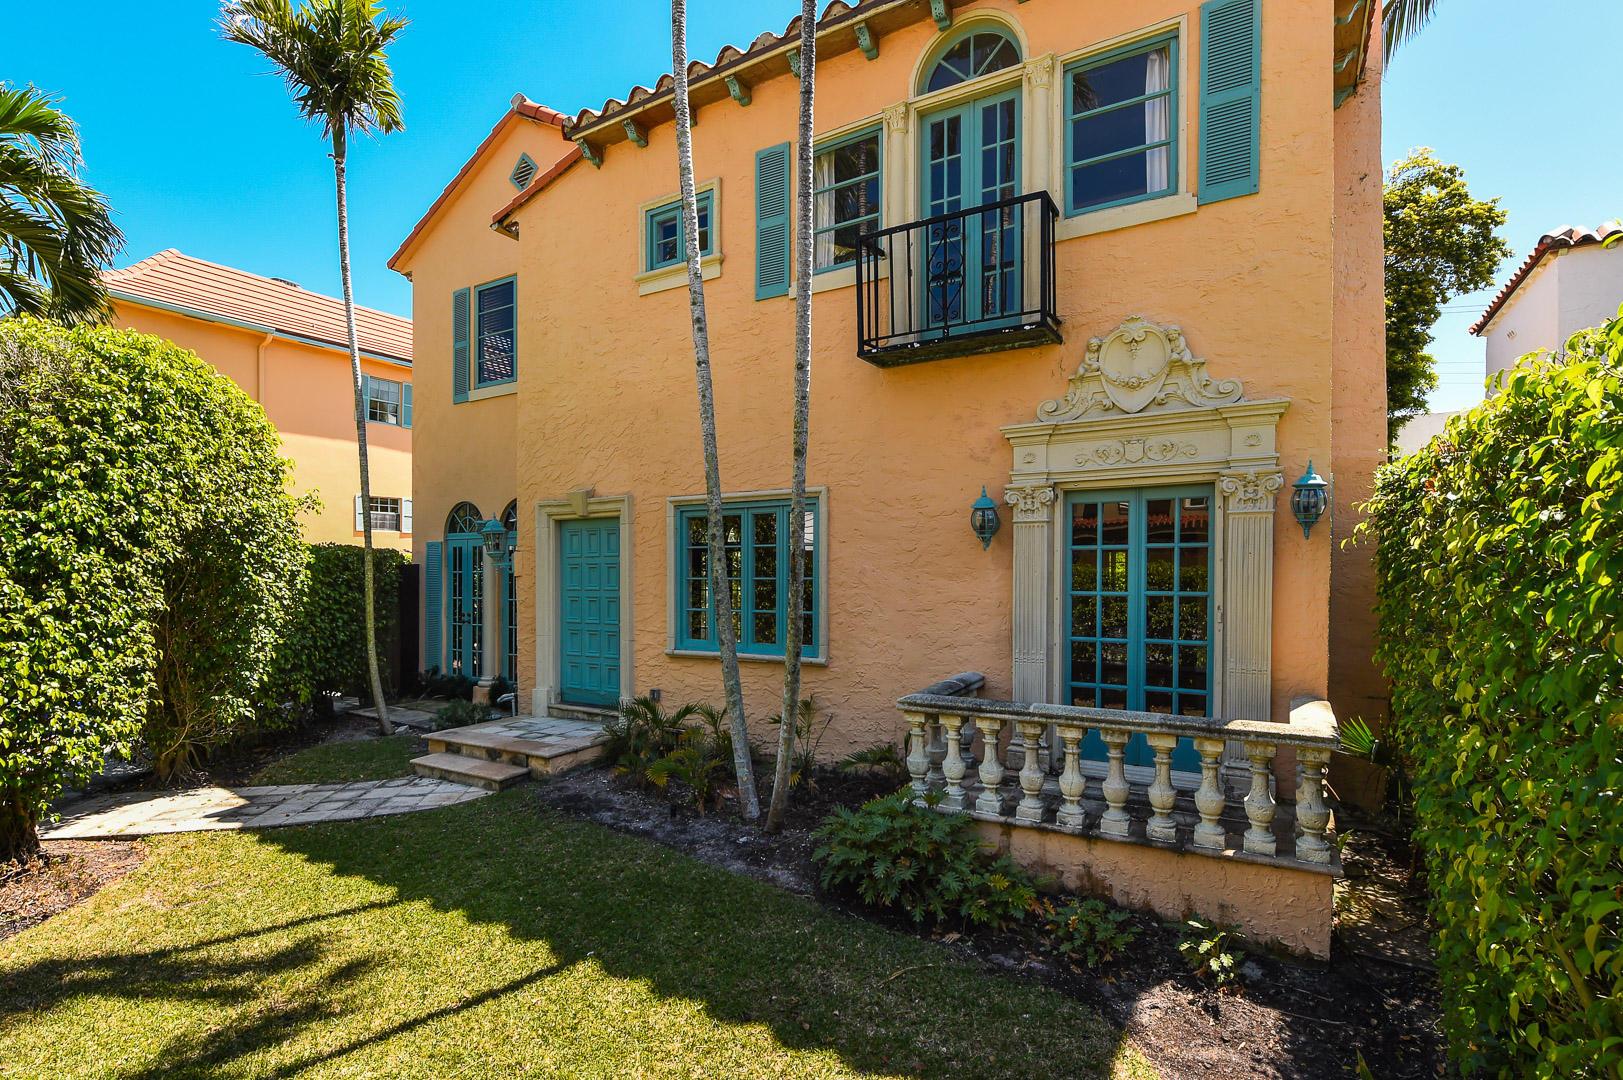 218 Everglade Avenue, Palm Beach, Florida 33480, 4 Bedrooms Bedrooms, ,3.1 BathroomsBathrooms,Single Family,For Sale,Everglade,RX-10416534